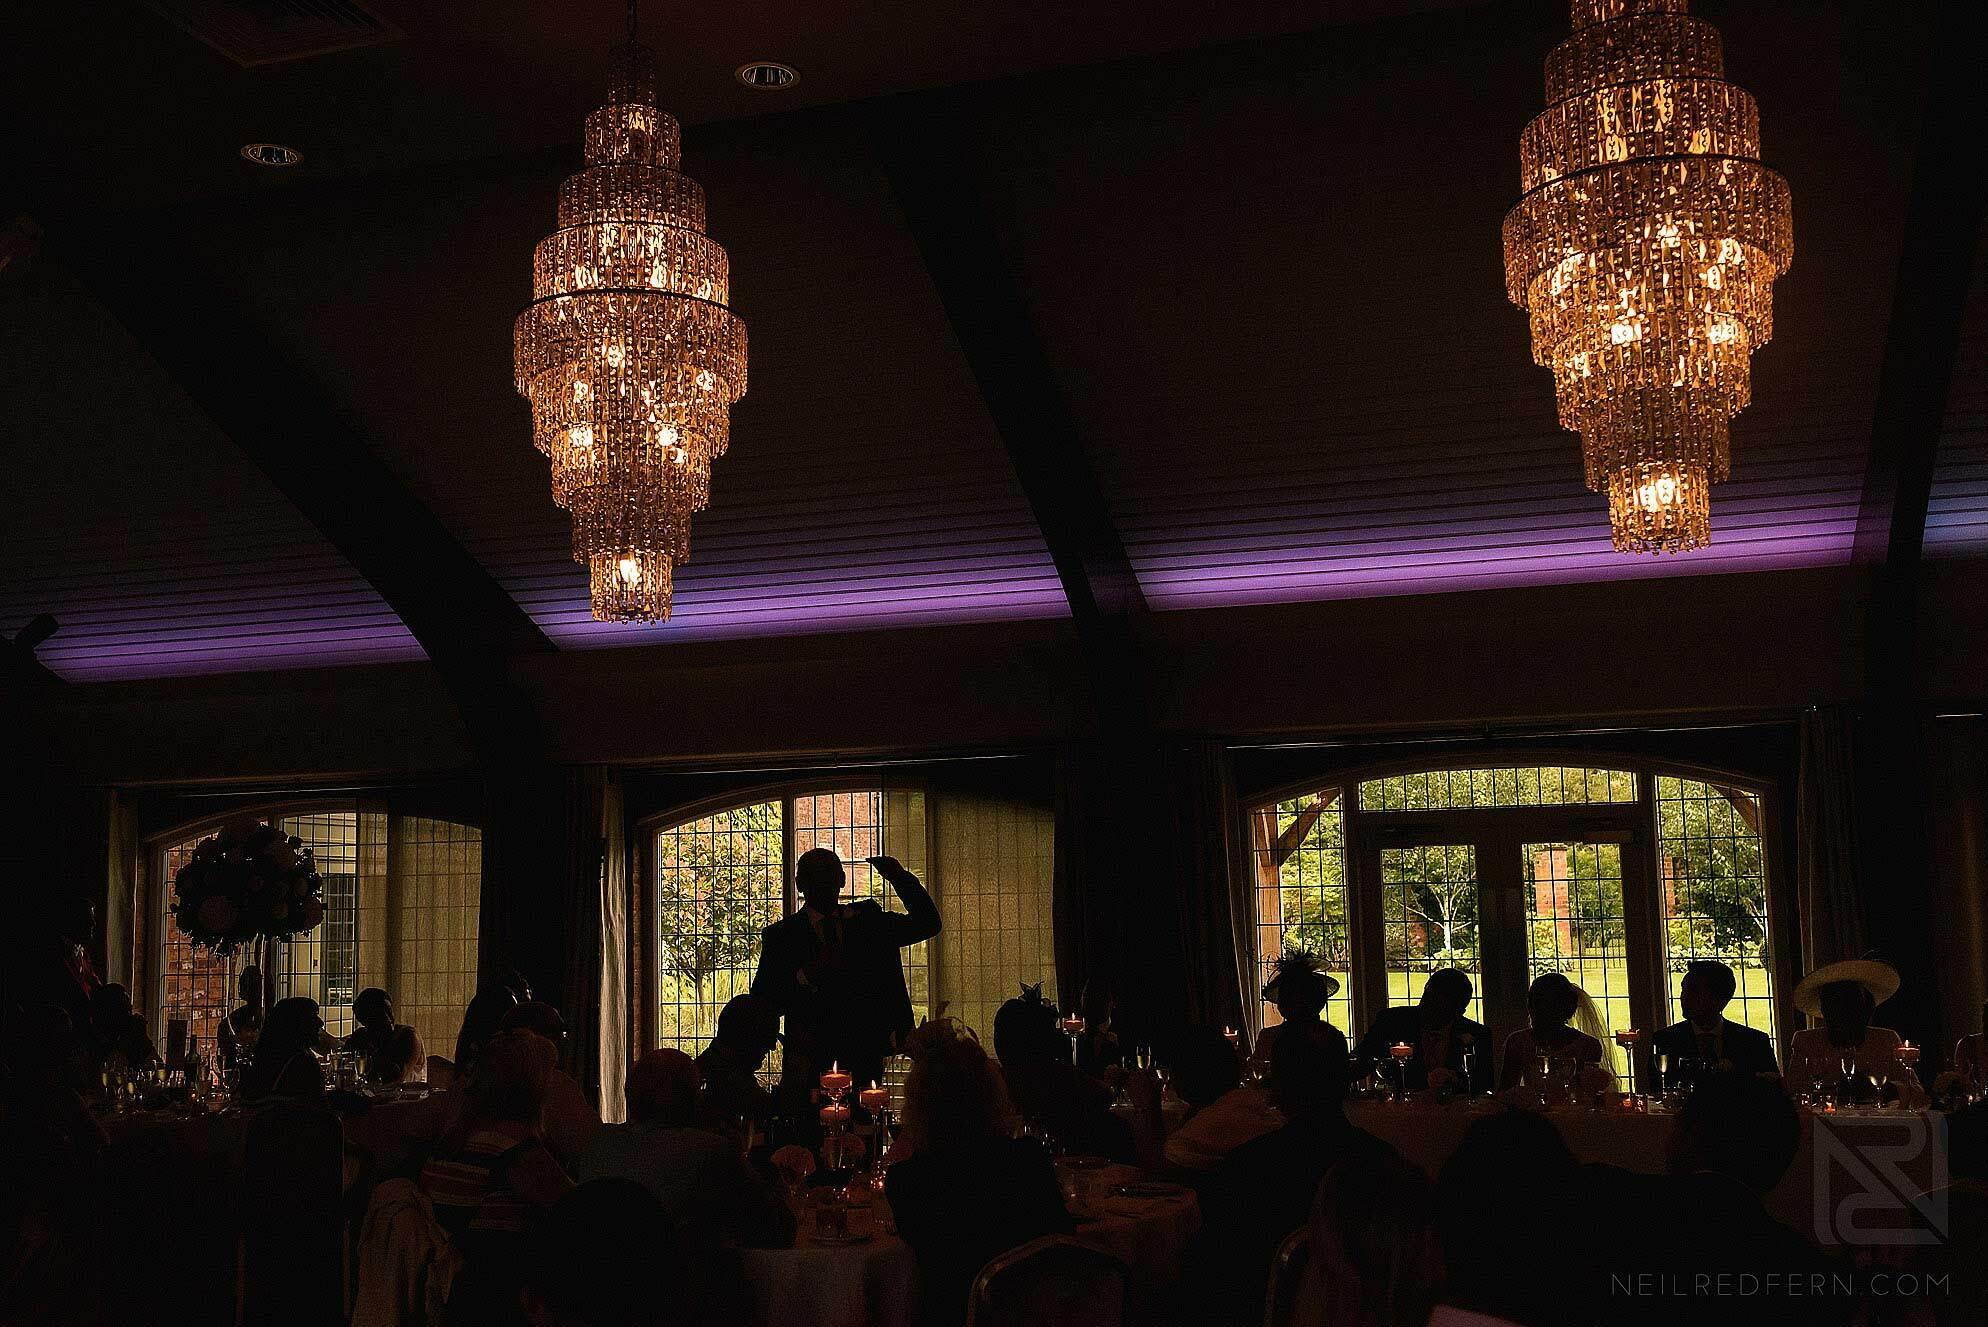 colshaw-hall-wedding-photographs-26